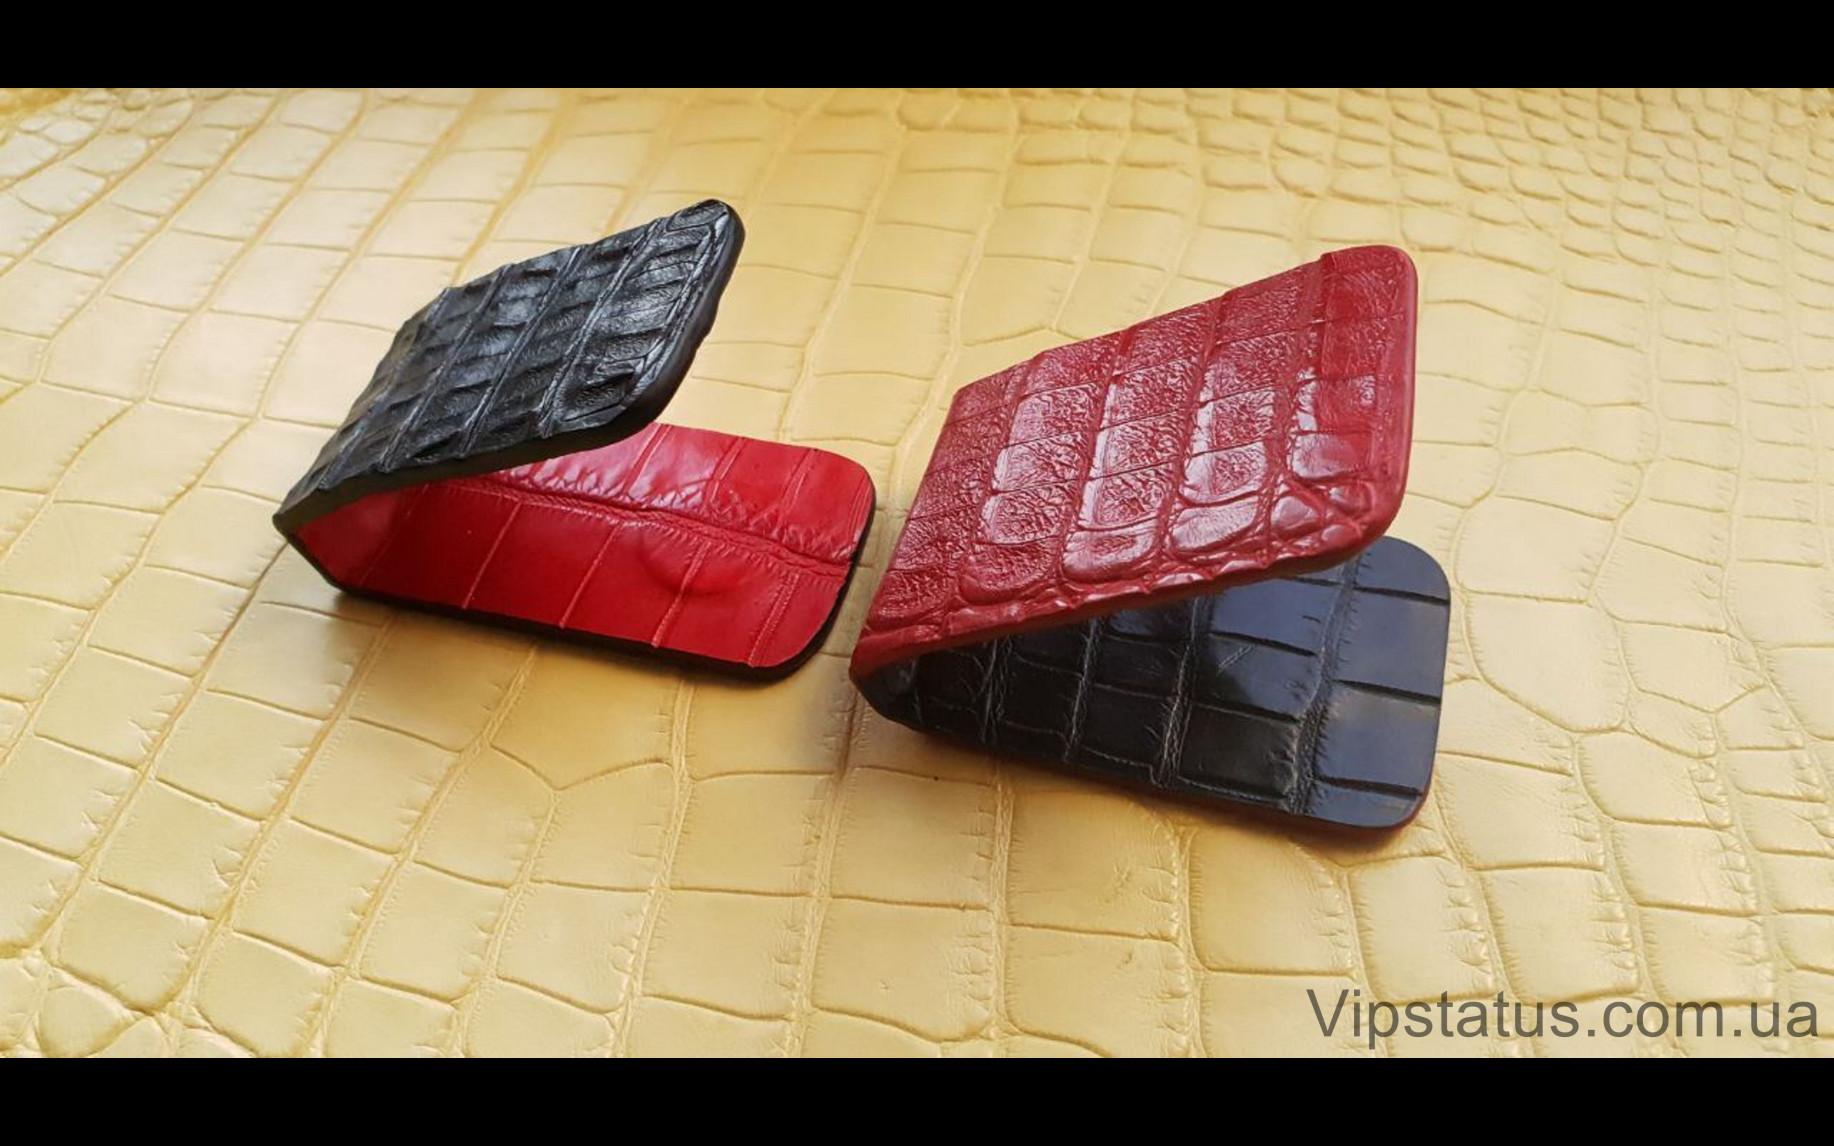 Elite Black King Премиум зажим для купюр Black King Premium bill clip image 3